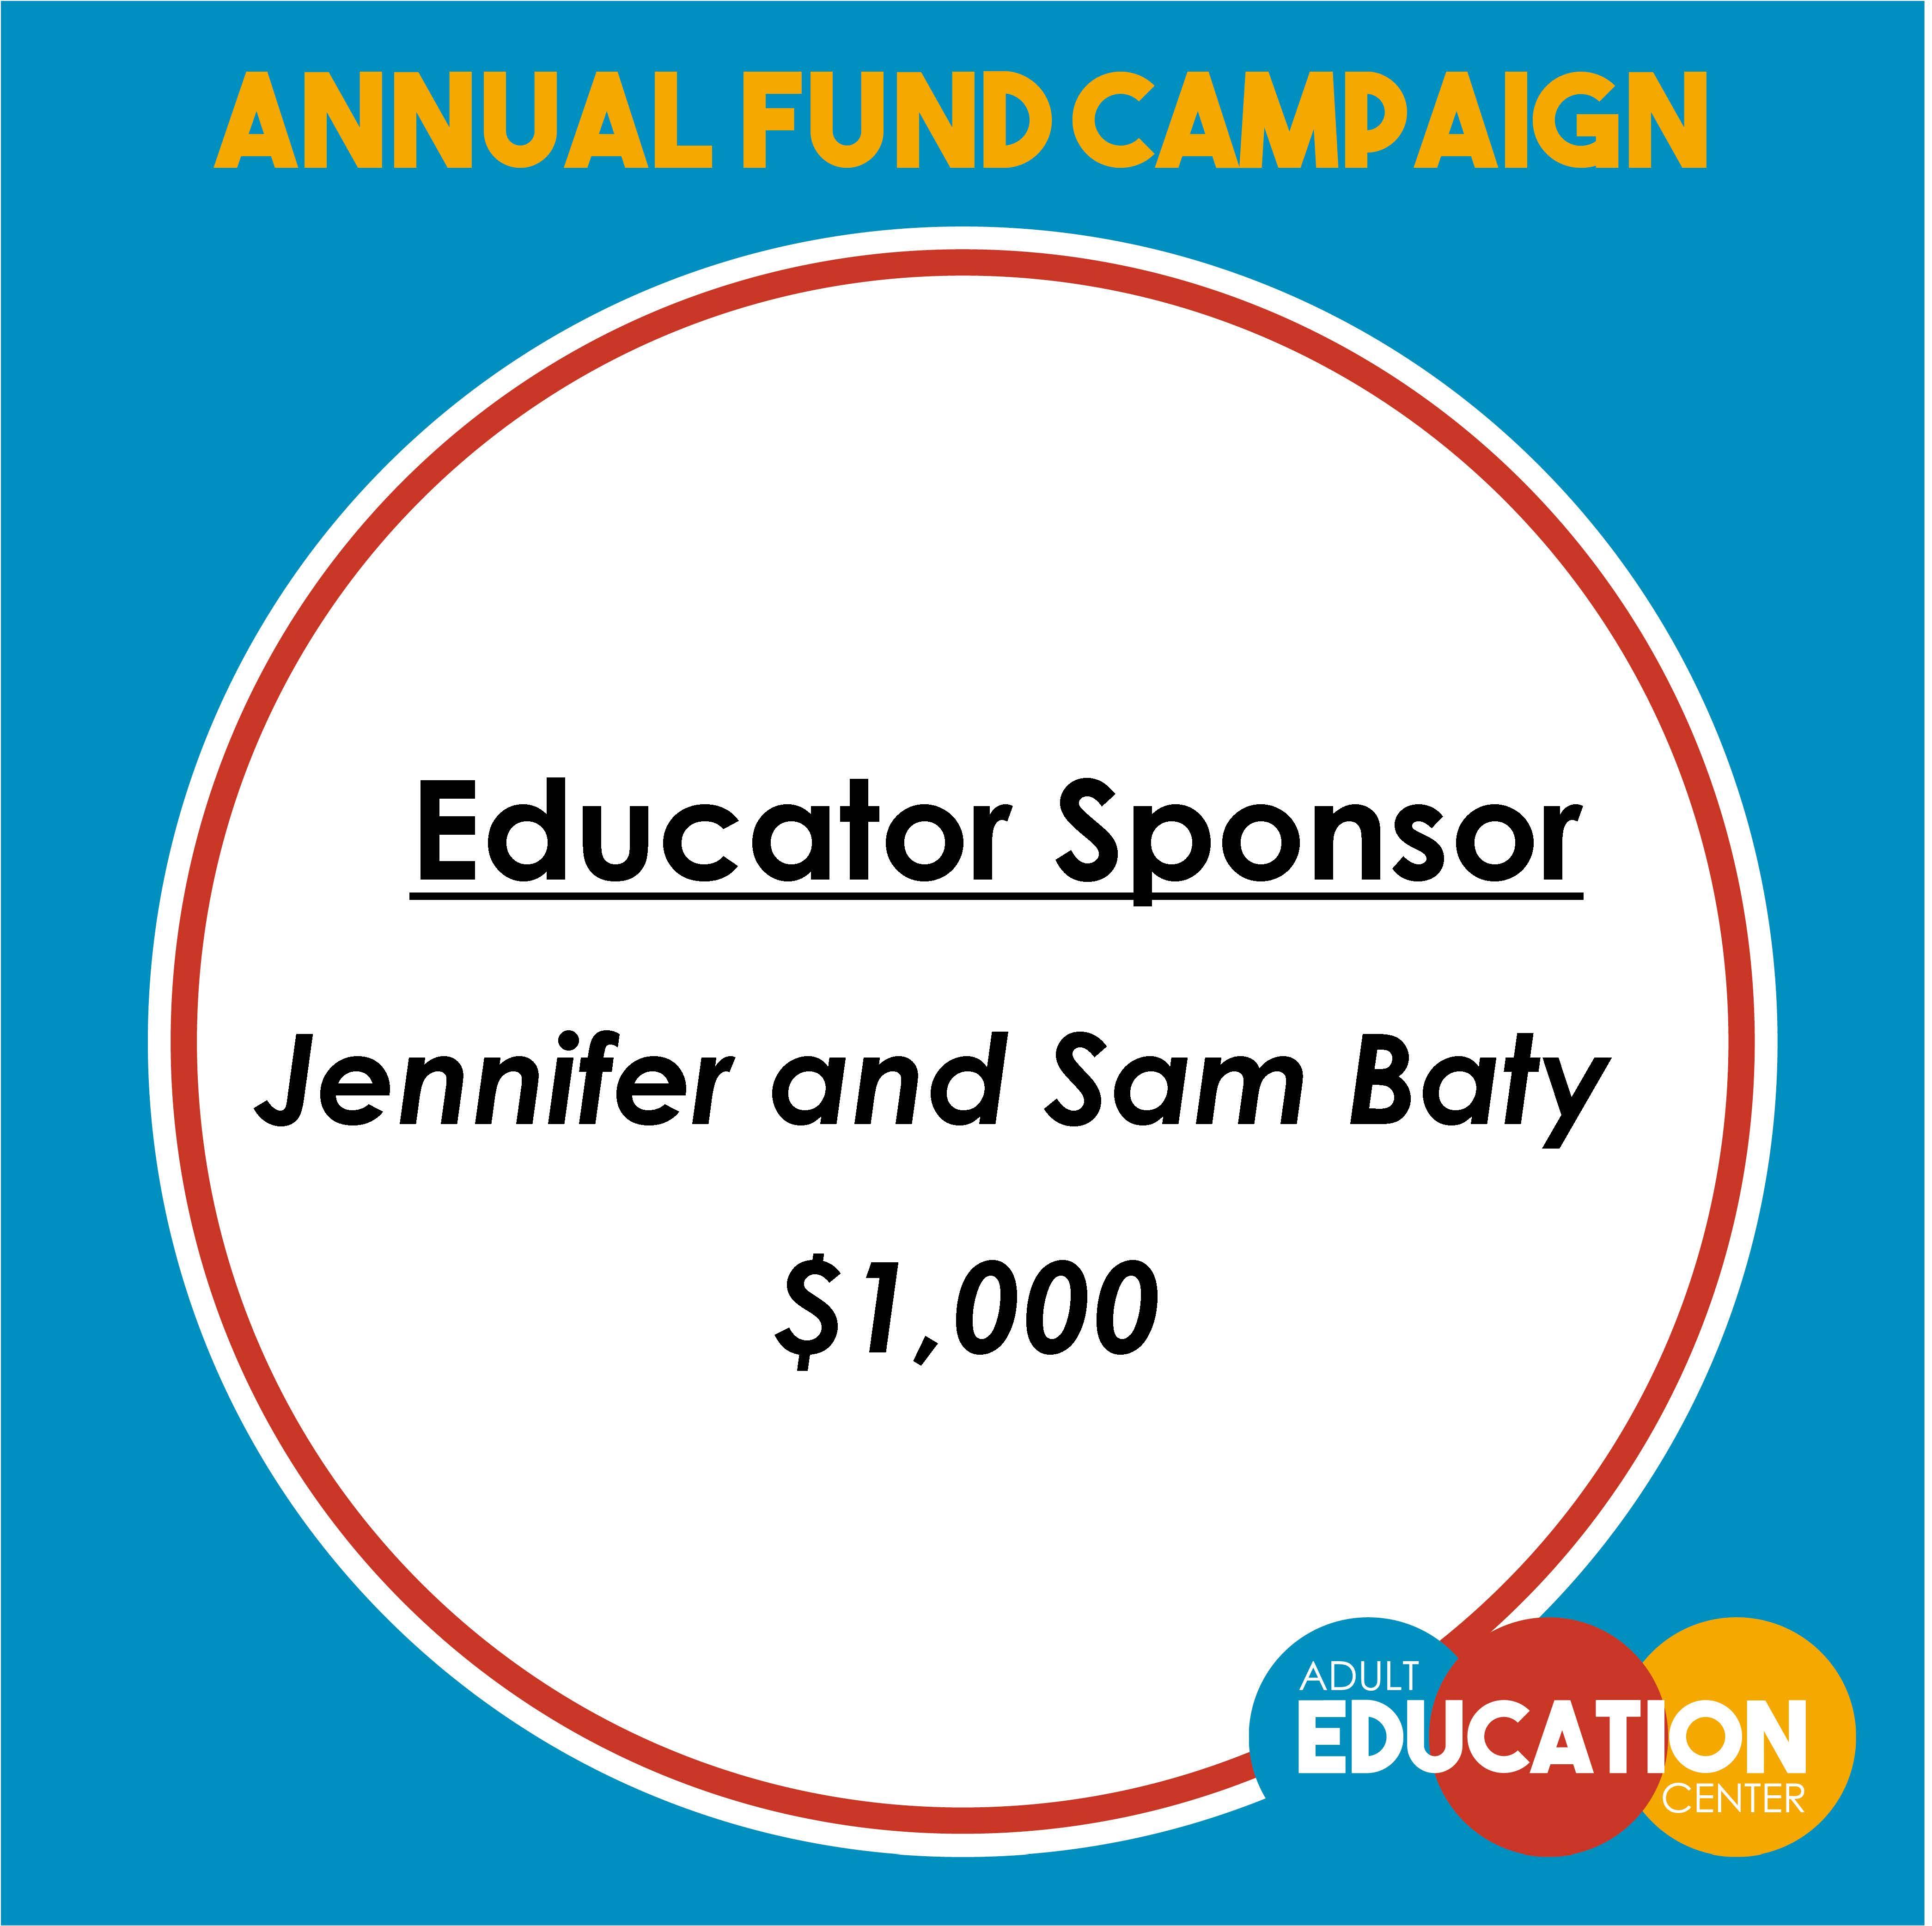 Jennifer and Sam Baty - Educator Sponsor - $1000